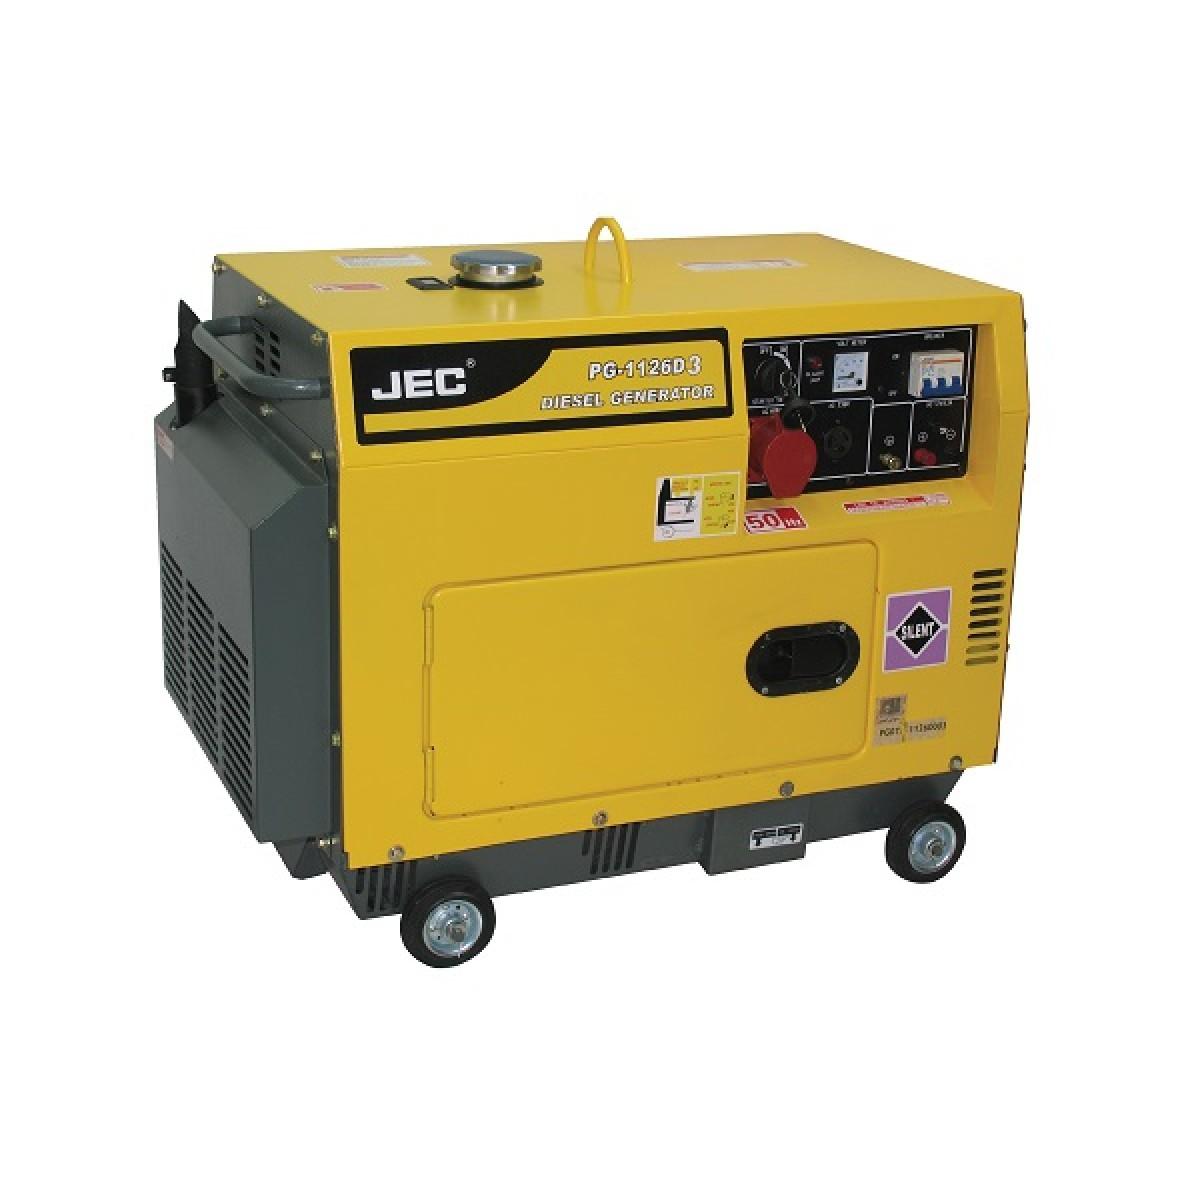 Three Phase 5 Kva Silent Type Diesel Generator Including